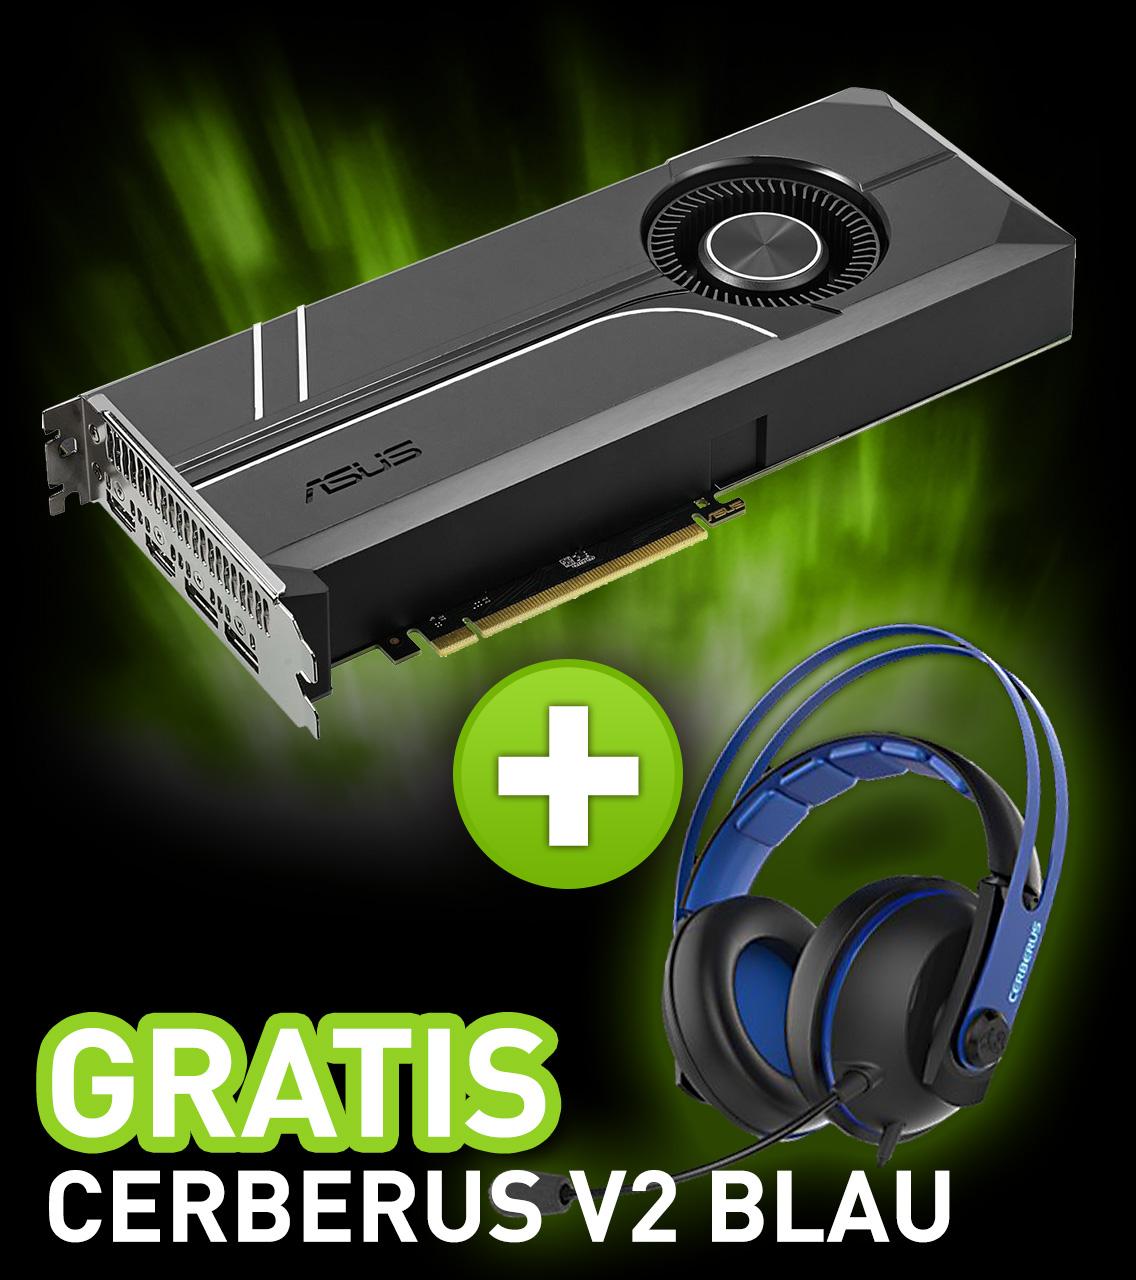 11GB Asus GeForce GTX 1080 Ti Turbo Aktiv PCIe 3.0 x16 (Retail)